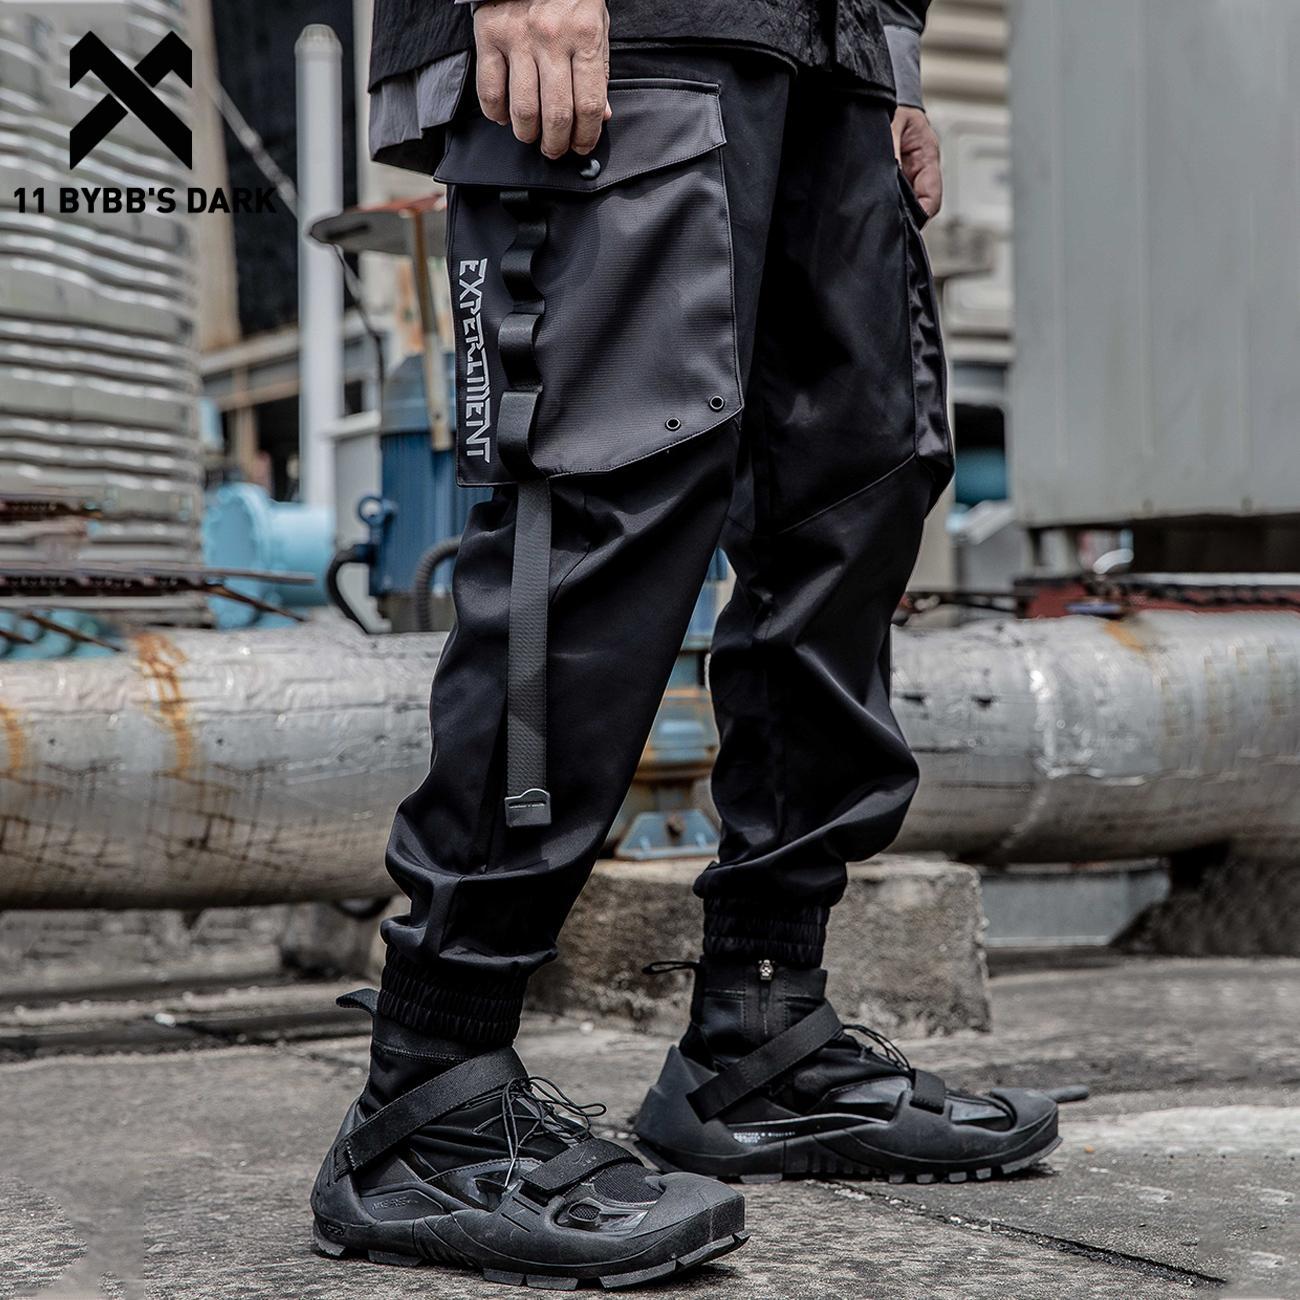 11 BYBB'S الظلام الهيب هوب السراويل البضائع الرجال 2021 وظيفية فضفاضة عداء ببطء الرجال السراويل الشارع الشهير Techwear شرائط جيوب السراويل فضفاضة